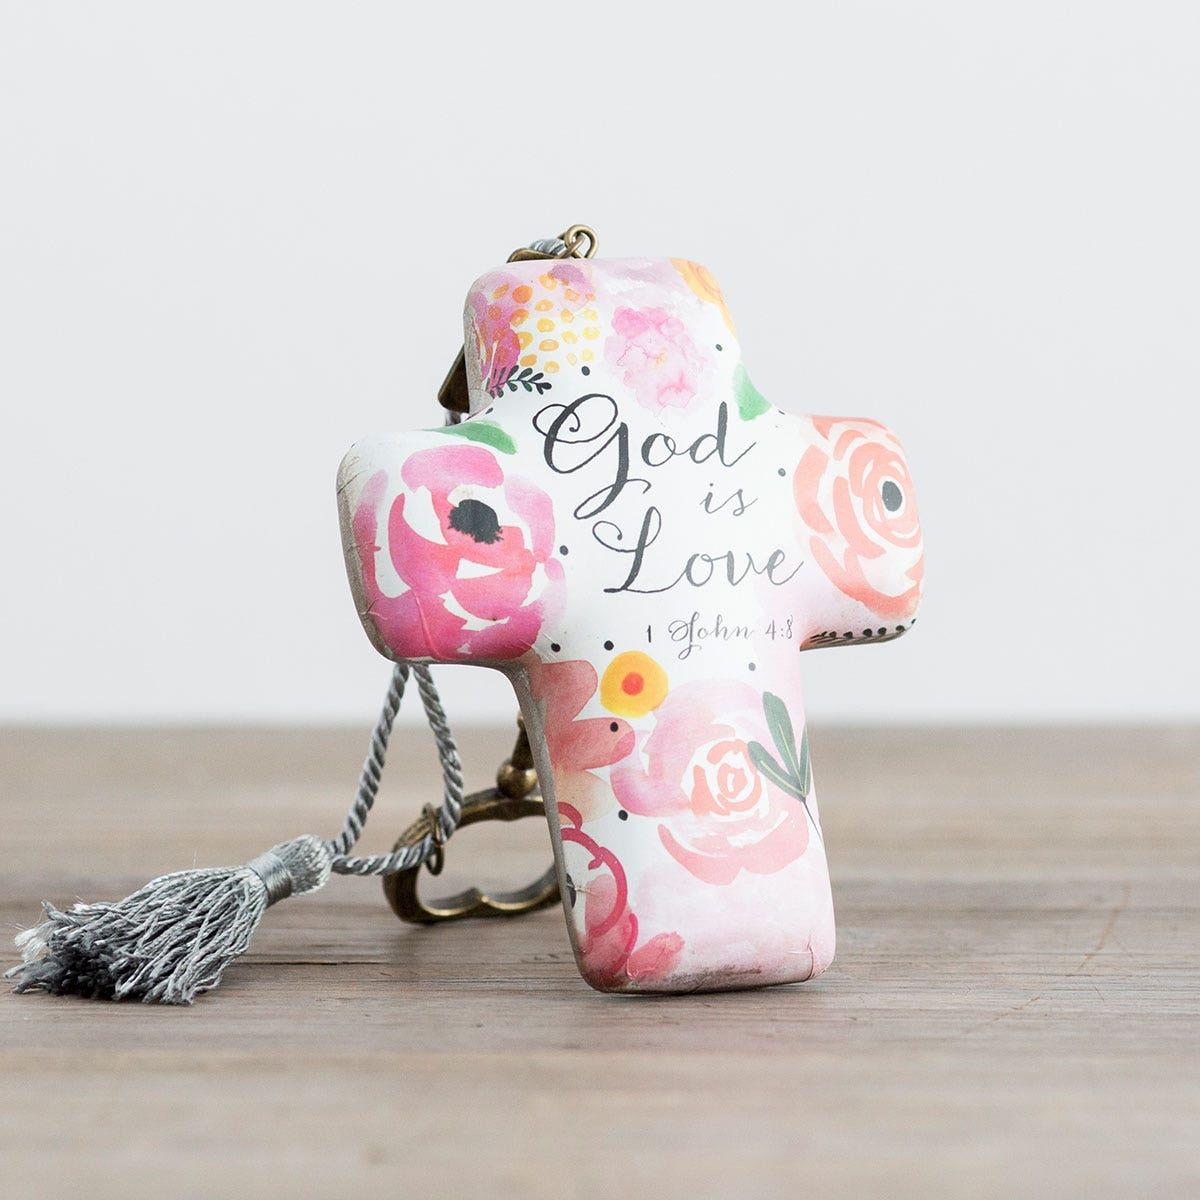 God Is Love - Artful Cross Sculpture